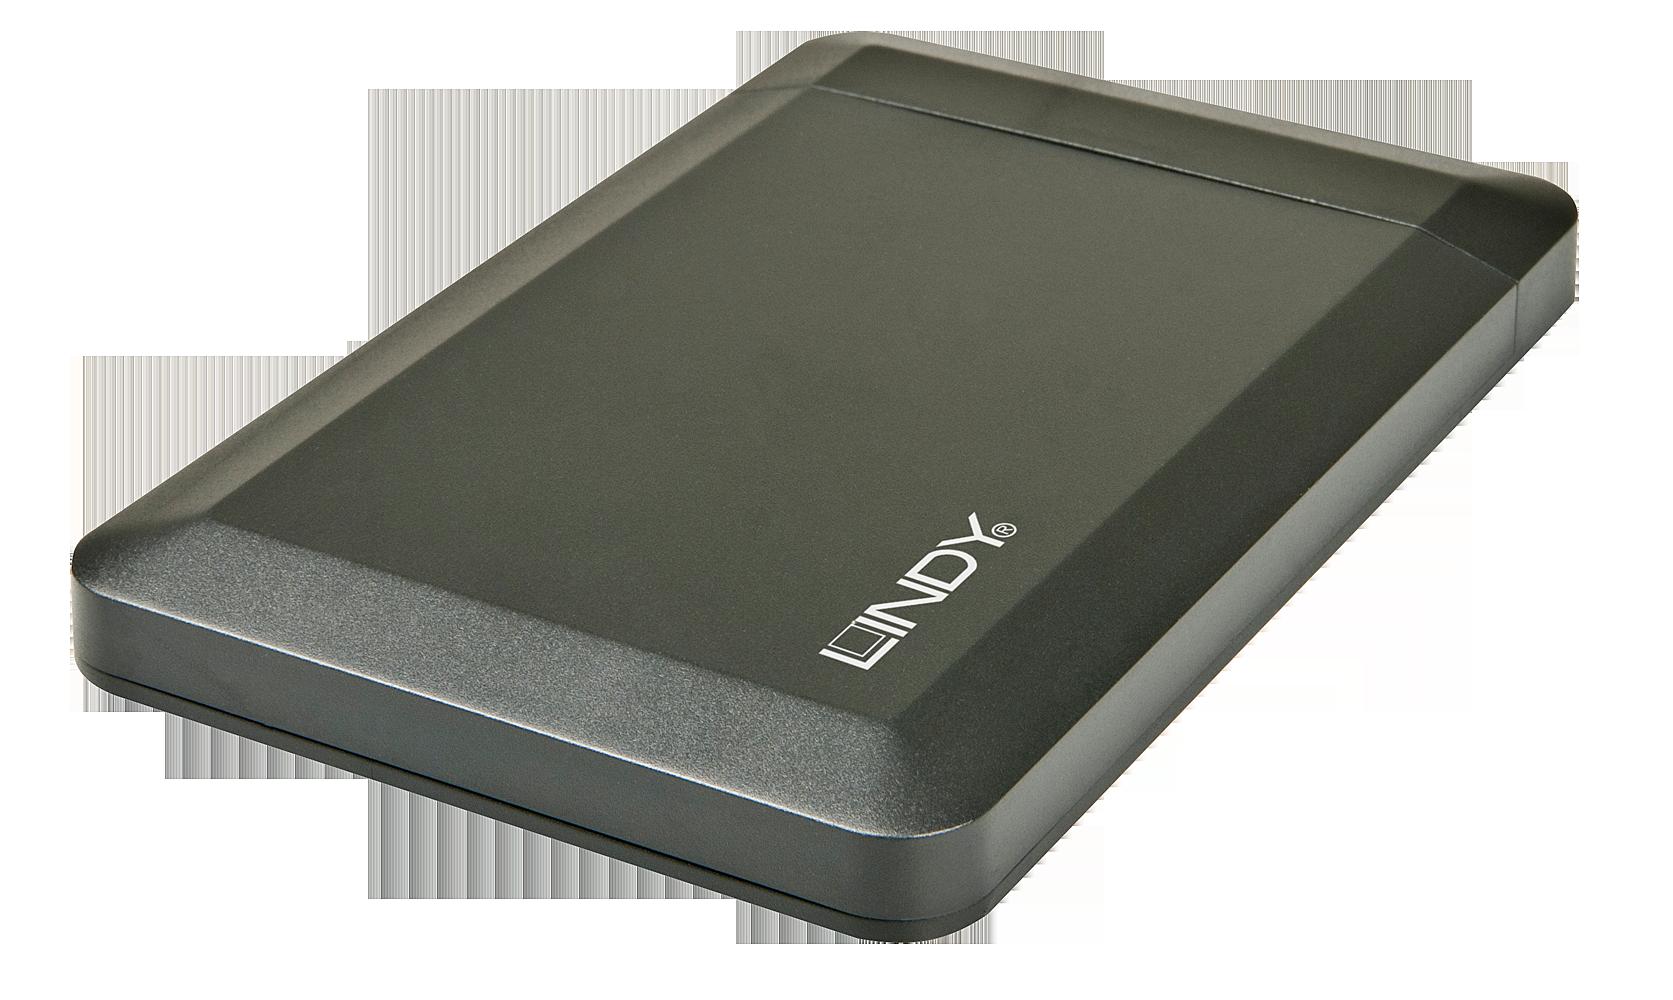 USB 3.0 & eSATA Geh�use 2,5